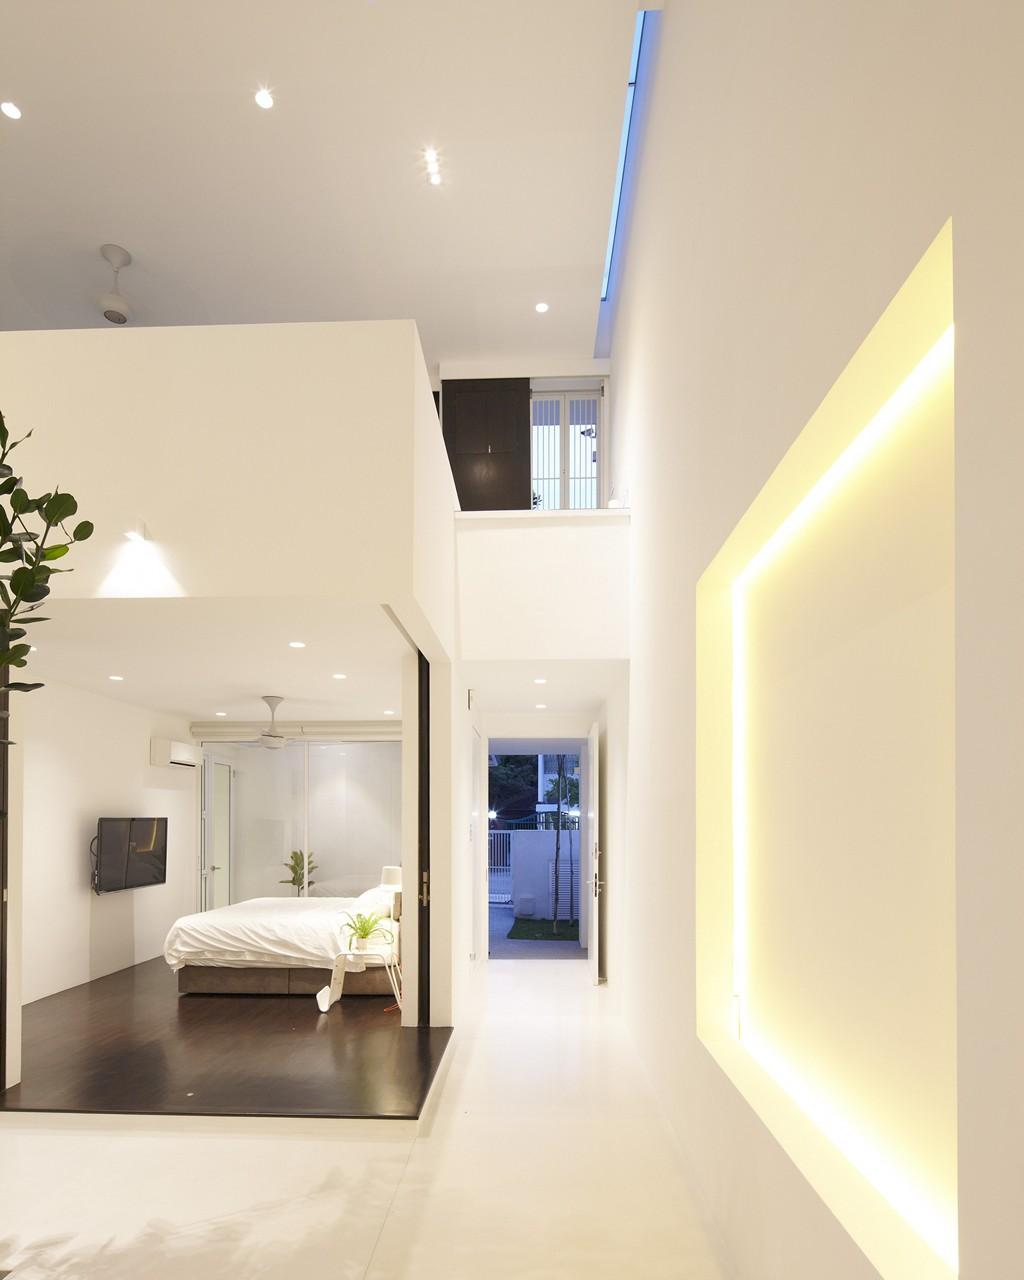 Idea 1336990 Ittka House By Fabian Tan Architect In Kuala Lumpur Malaysia